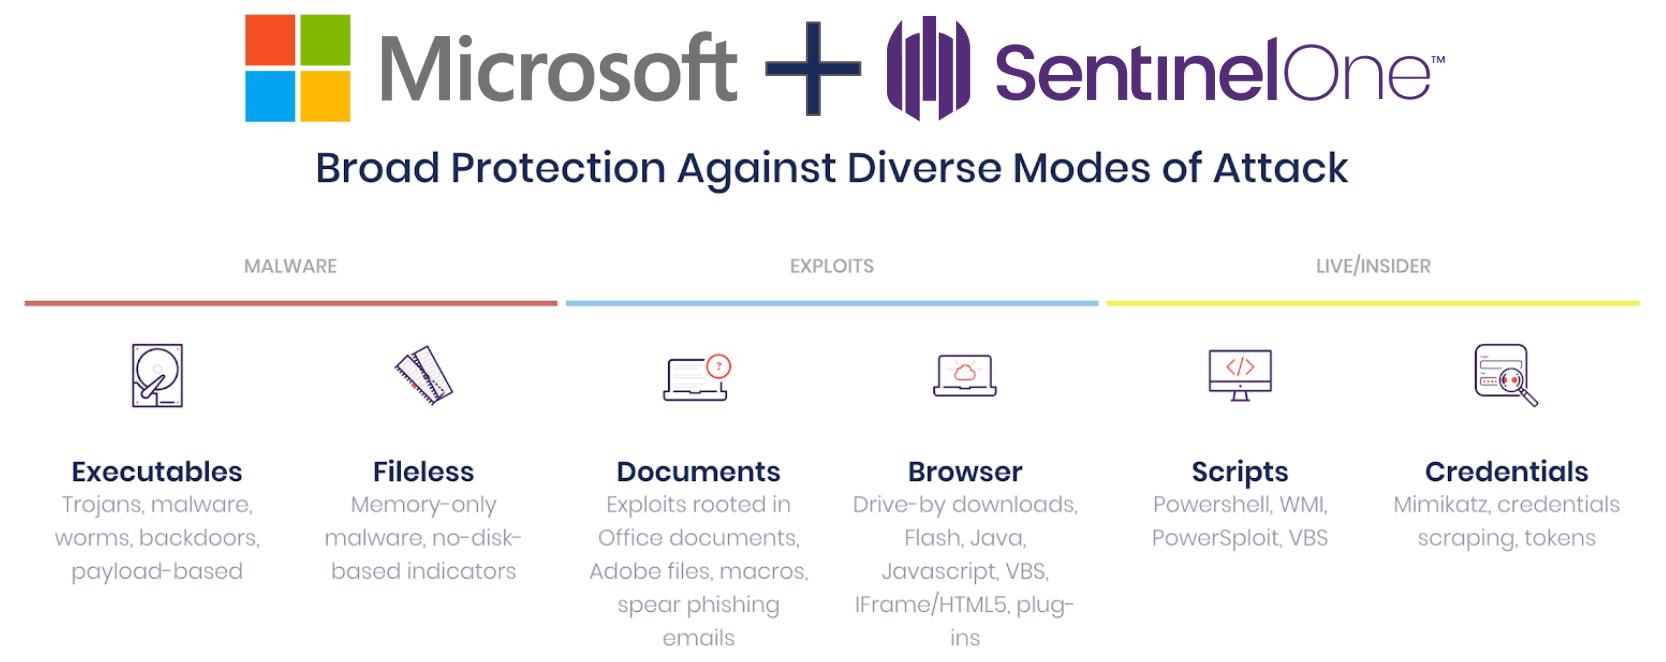 SentinelOne and Windows Defender ATP Integration